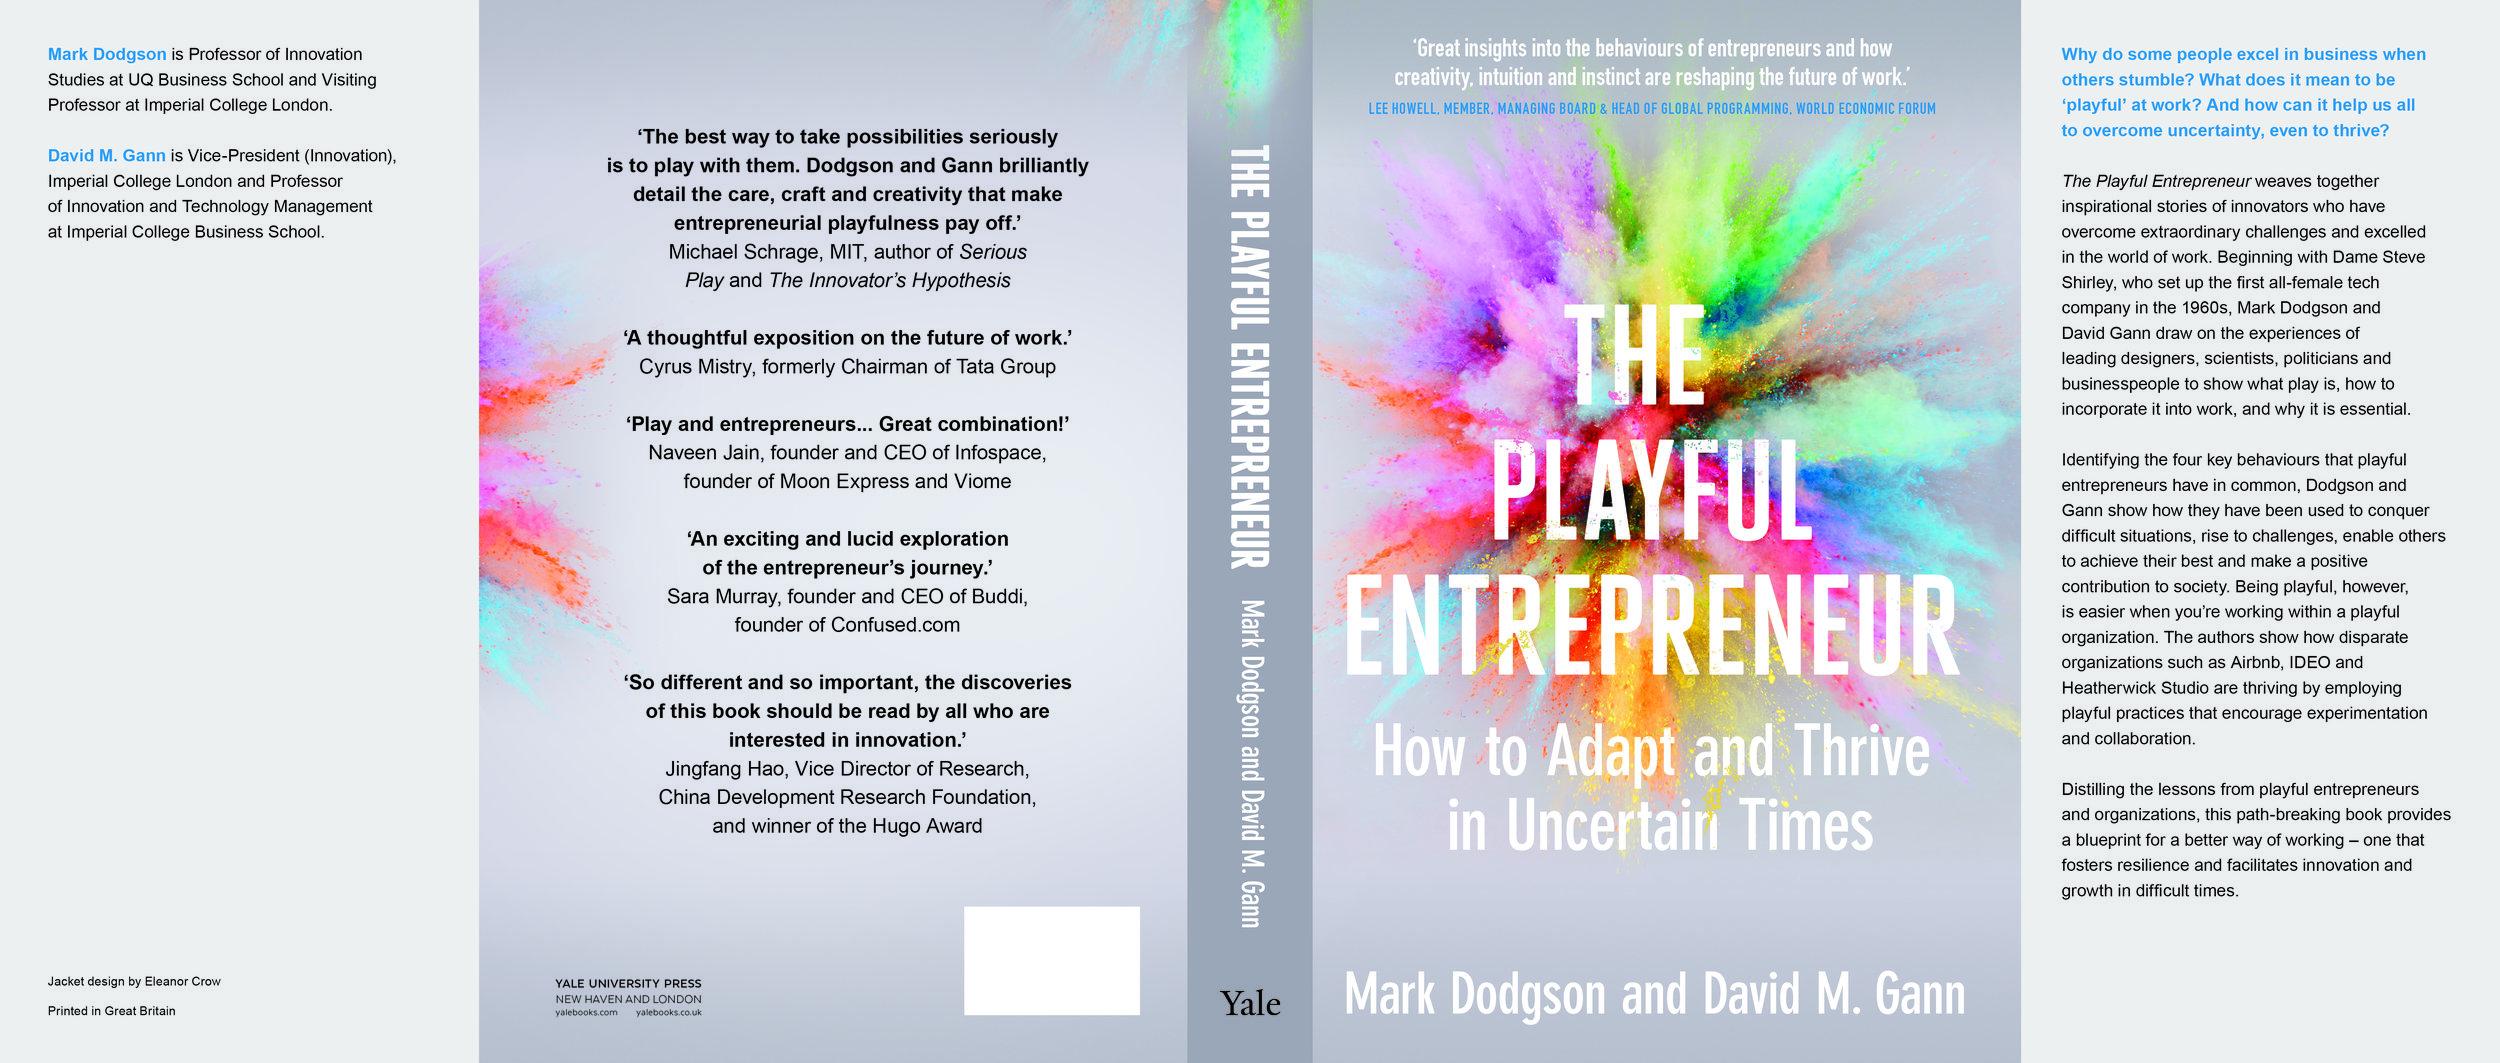 The Playful Entrepreneur D HB layout.jpg